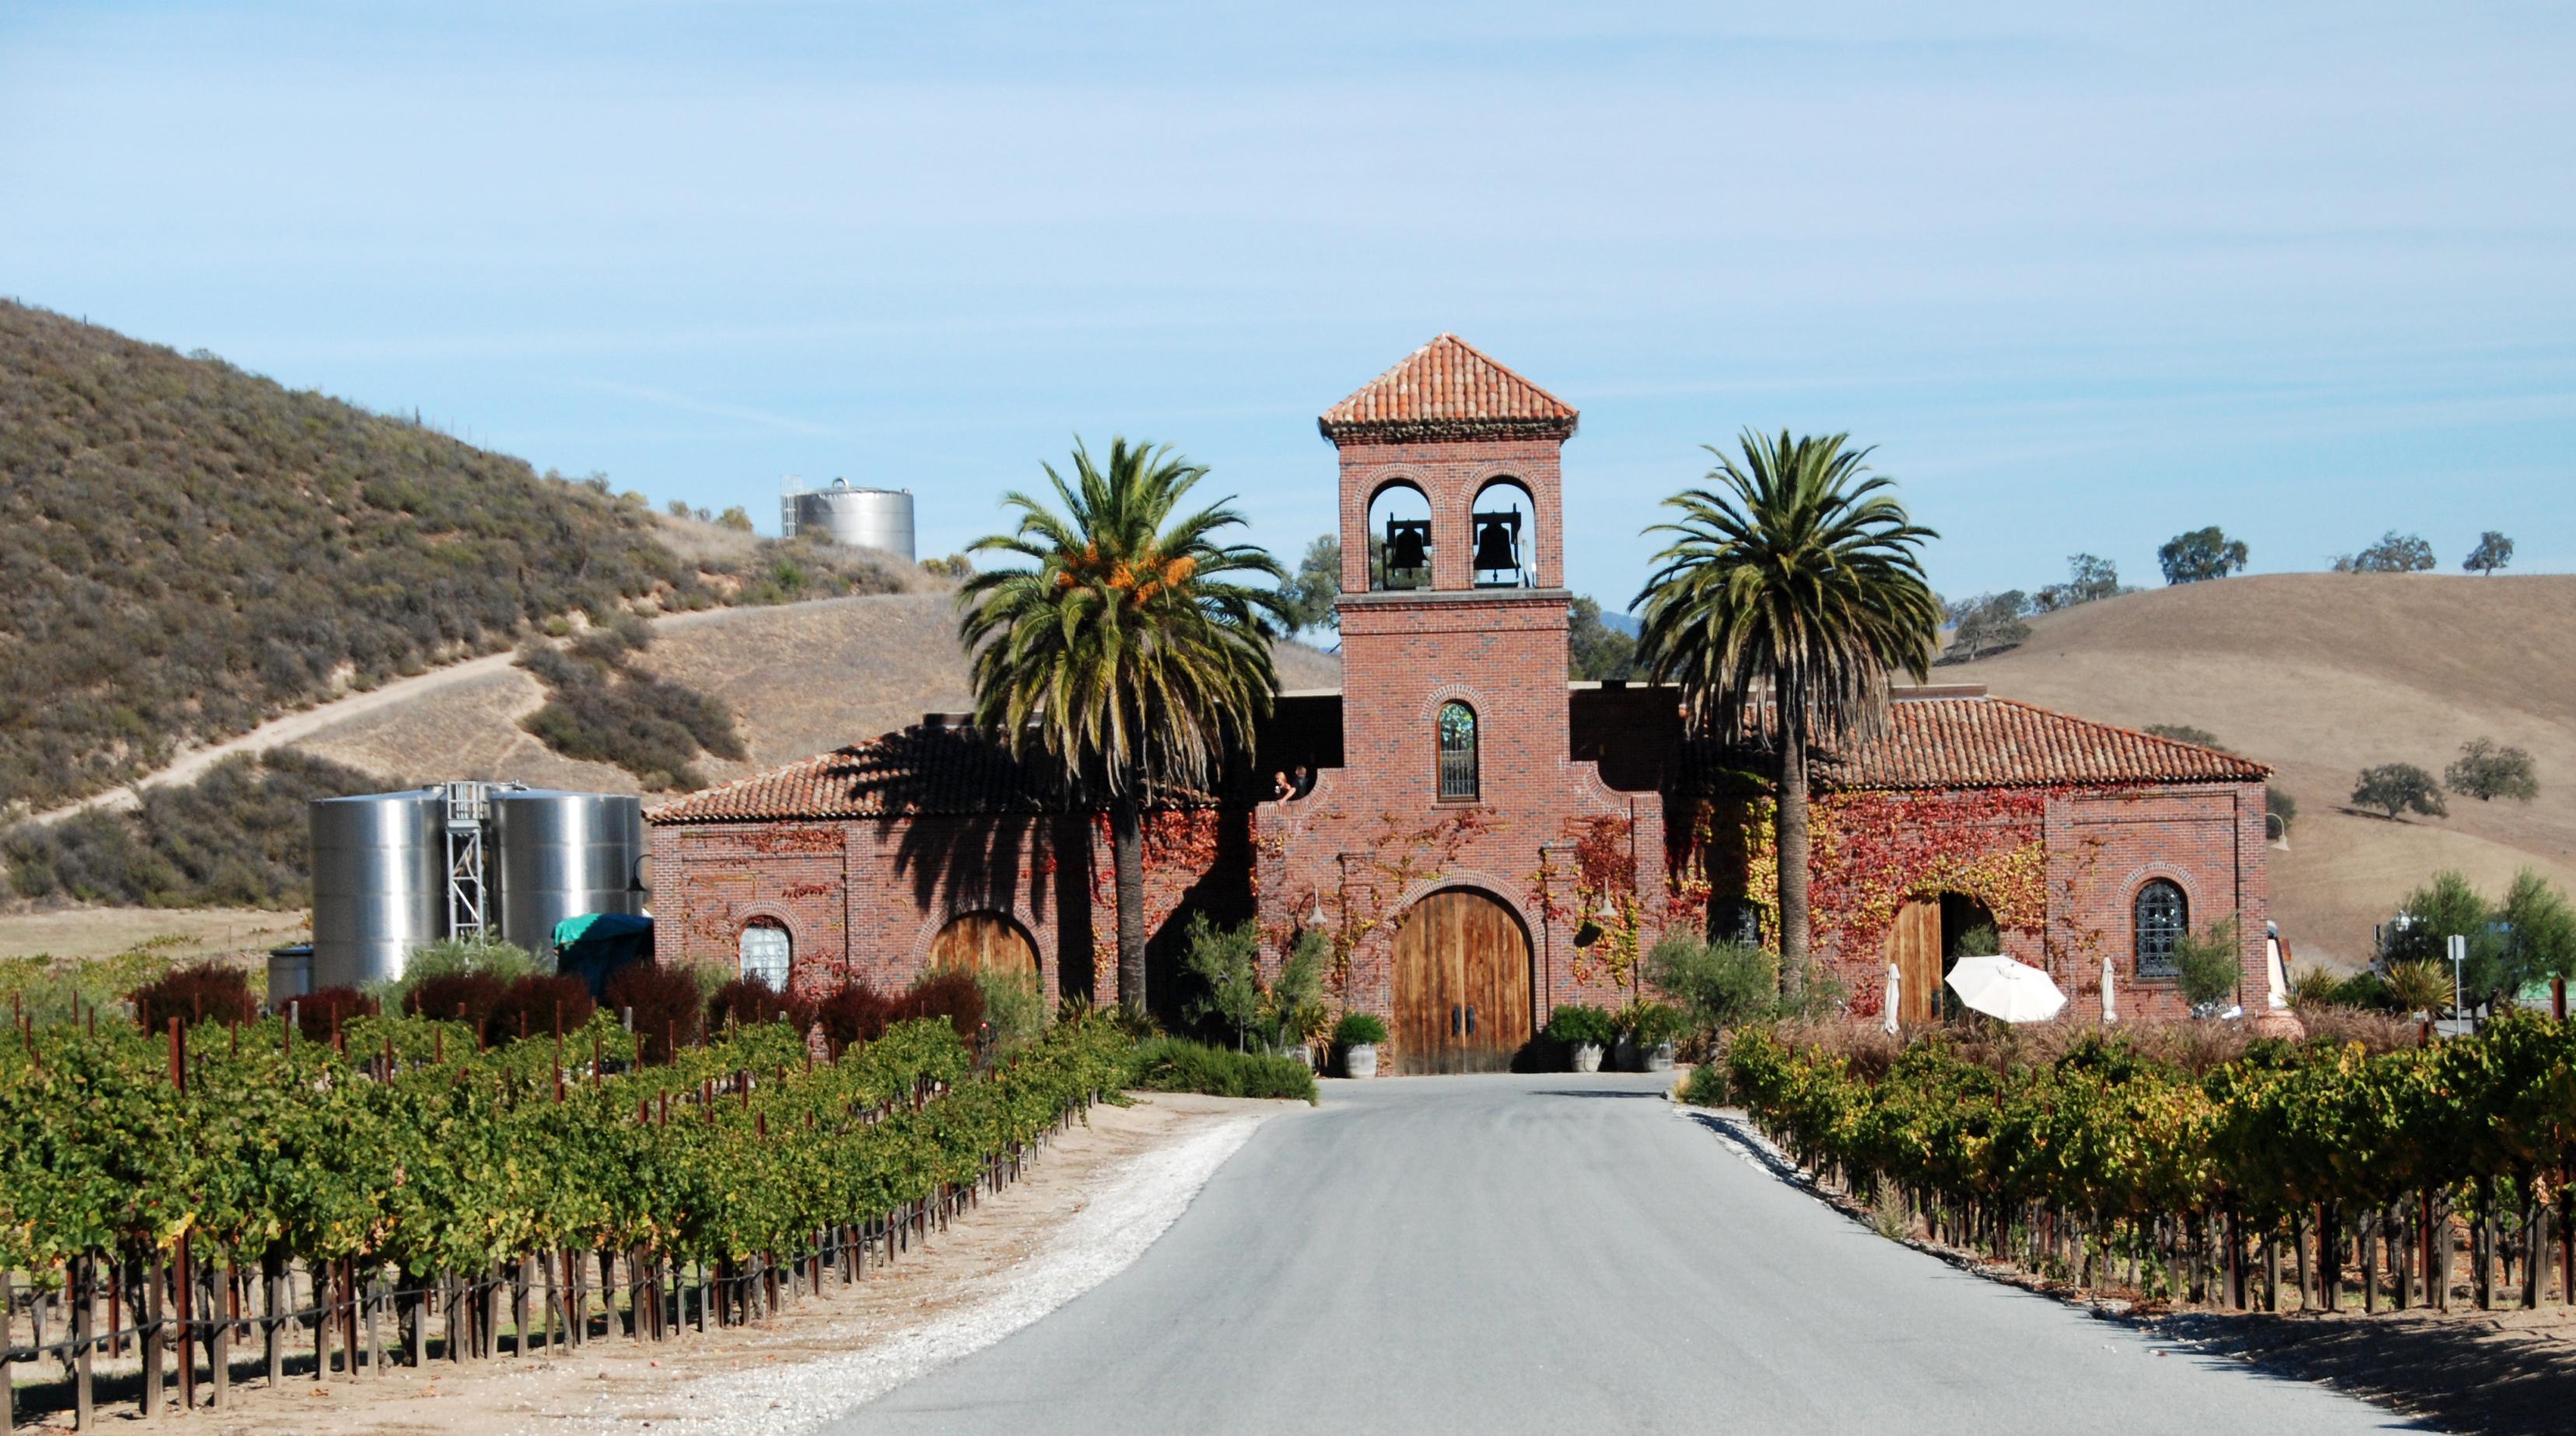 Pietra Santa Winery Near Hollister Shore Looks Nice